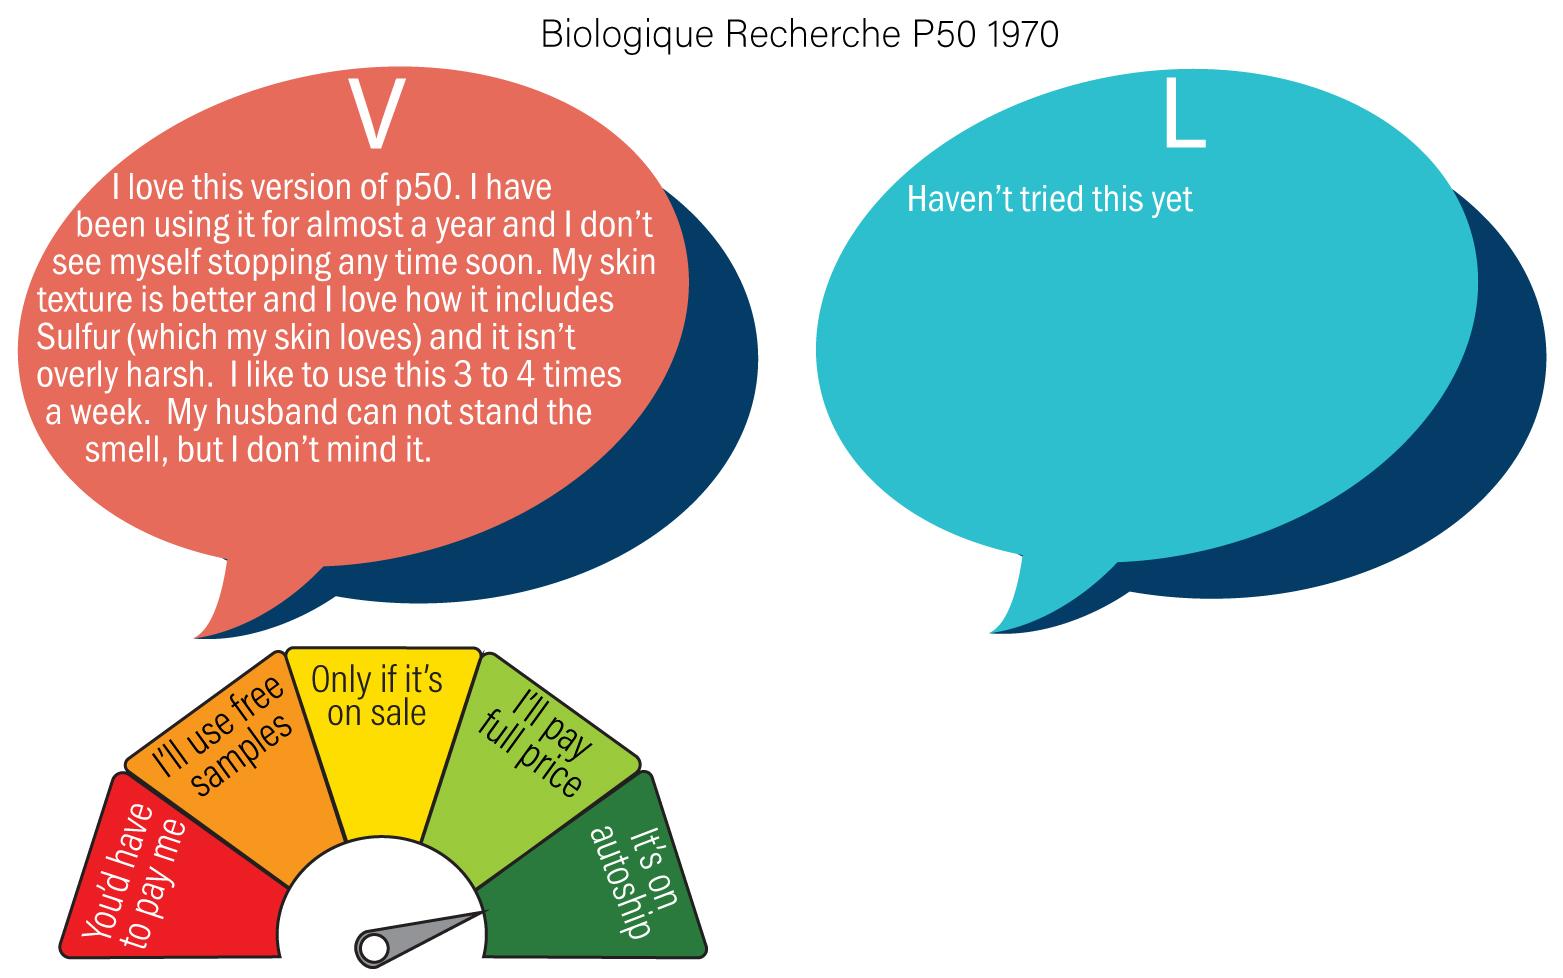 p50-1970-Review.jpg